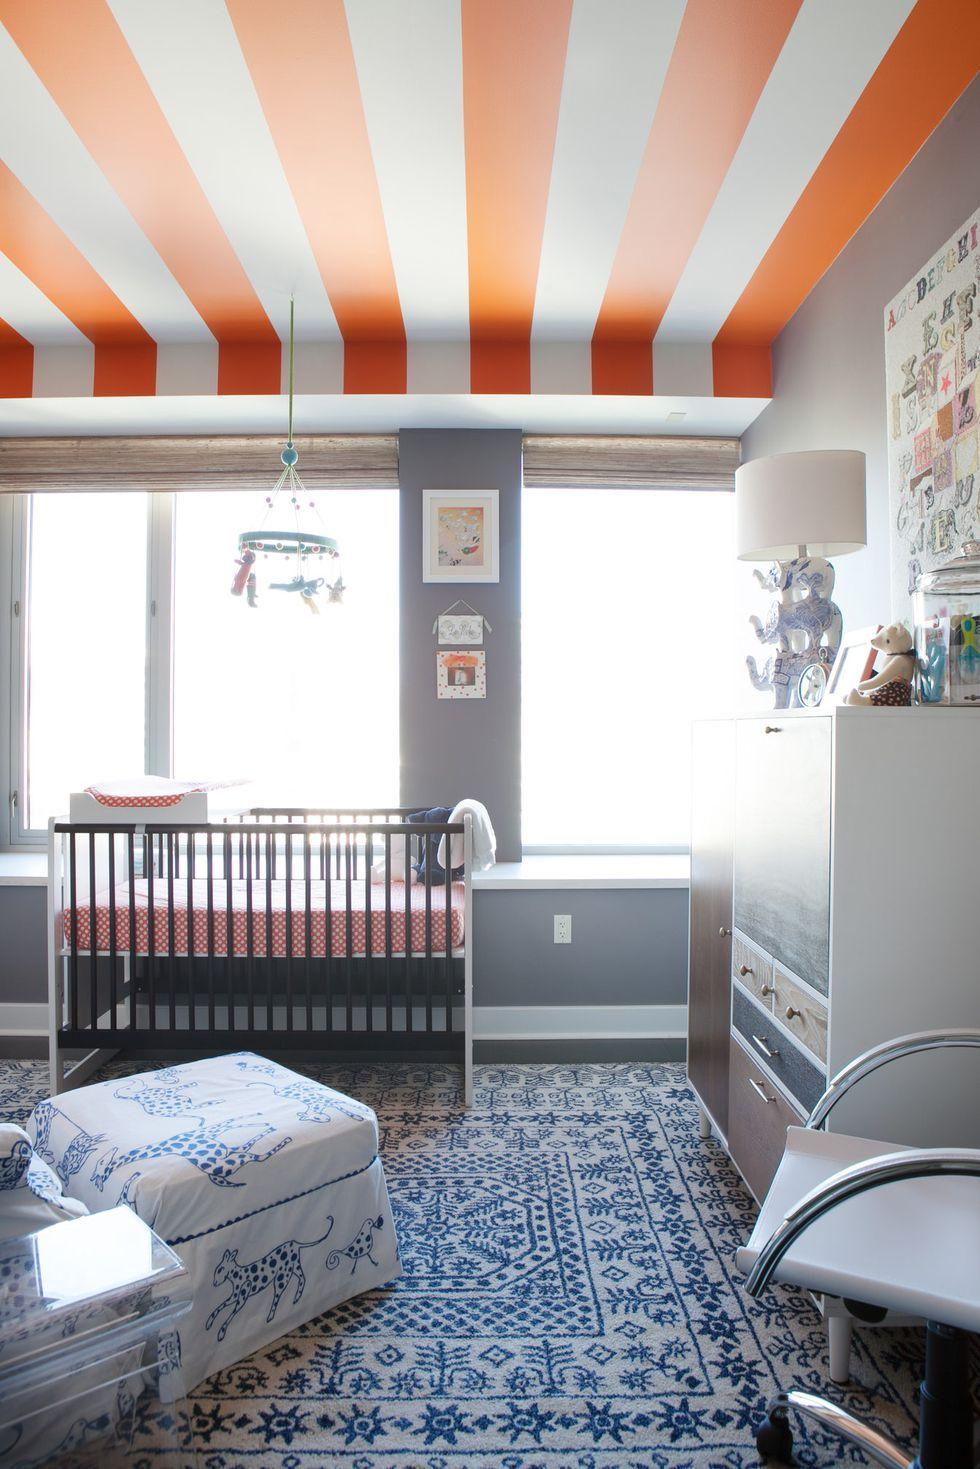 Julie Mikos-ουδέτερο παιδικό δωμάτιο